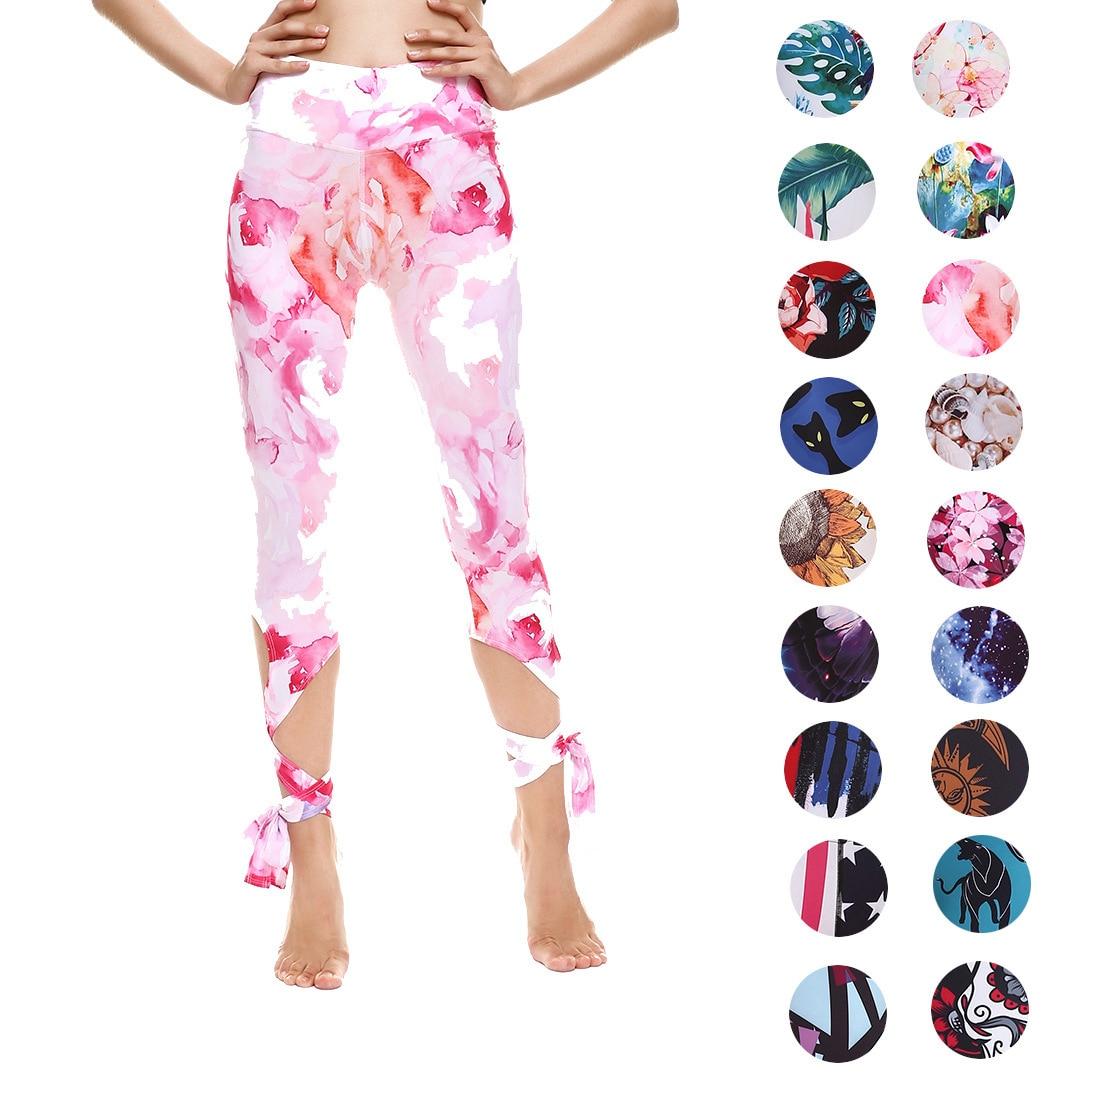 Ladies Fashion Slim Breathable Sweat Absorbing Running Sports Leggings Printing Multicolor Yo-ga Pants Hot Sports Bandage Pants